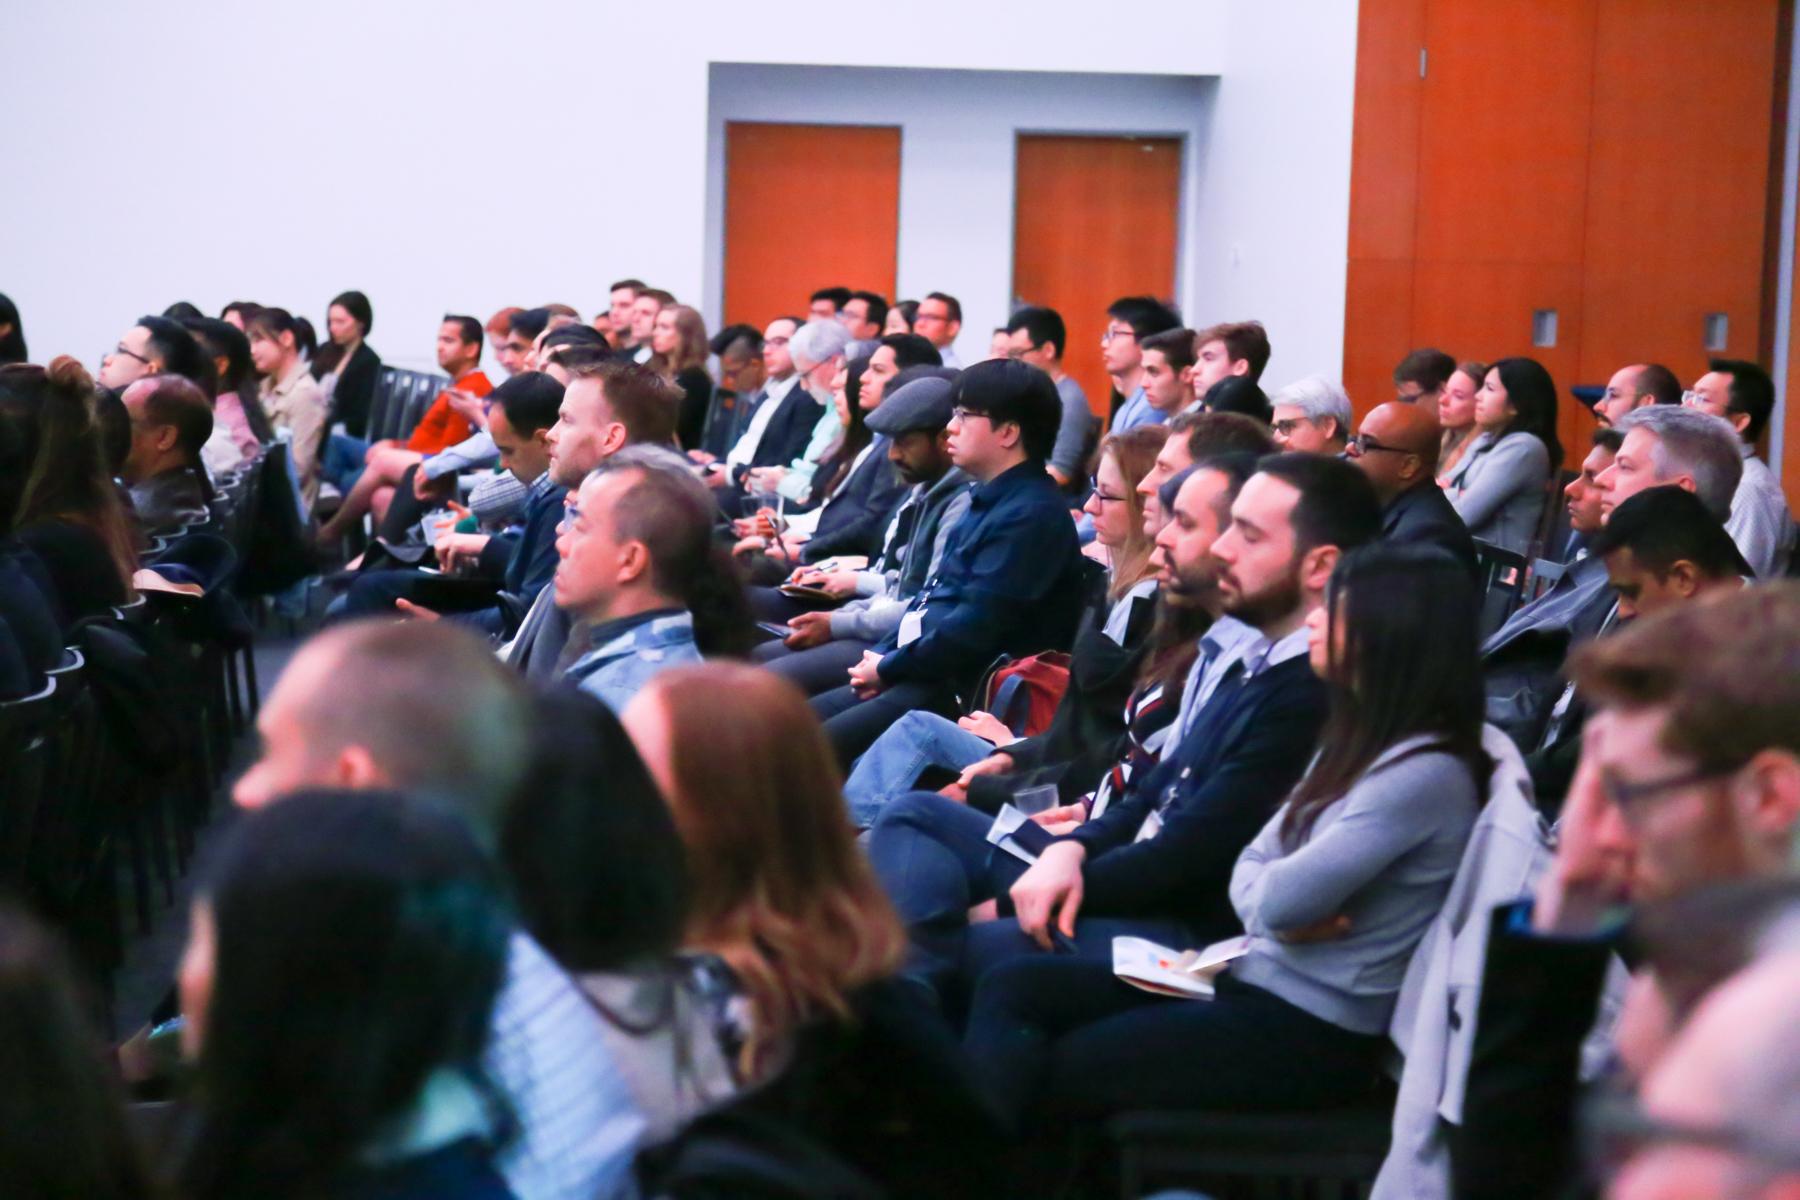 ABD_Conference_2018-003.jpg